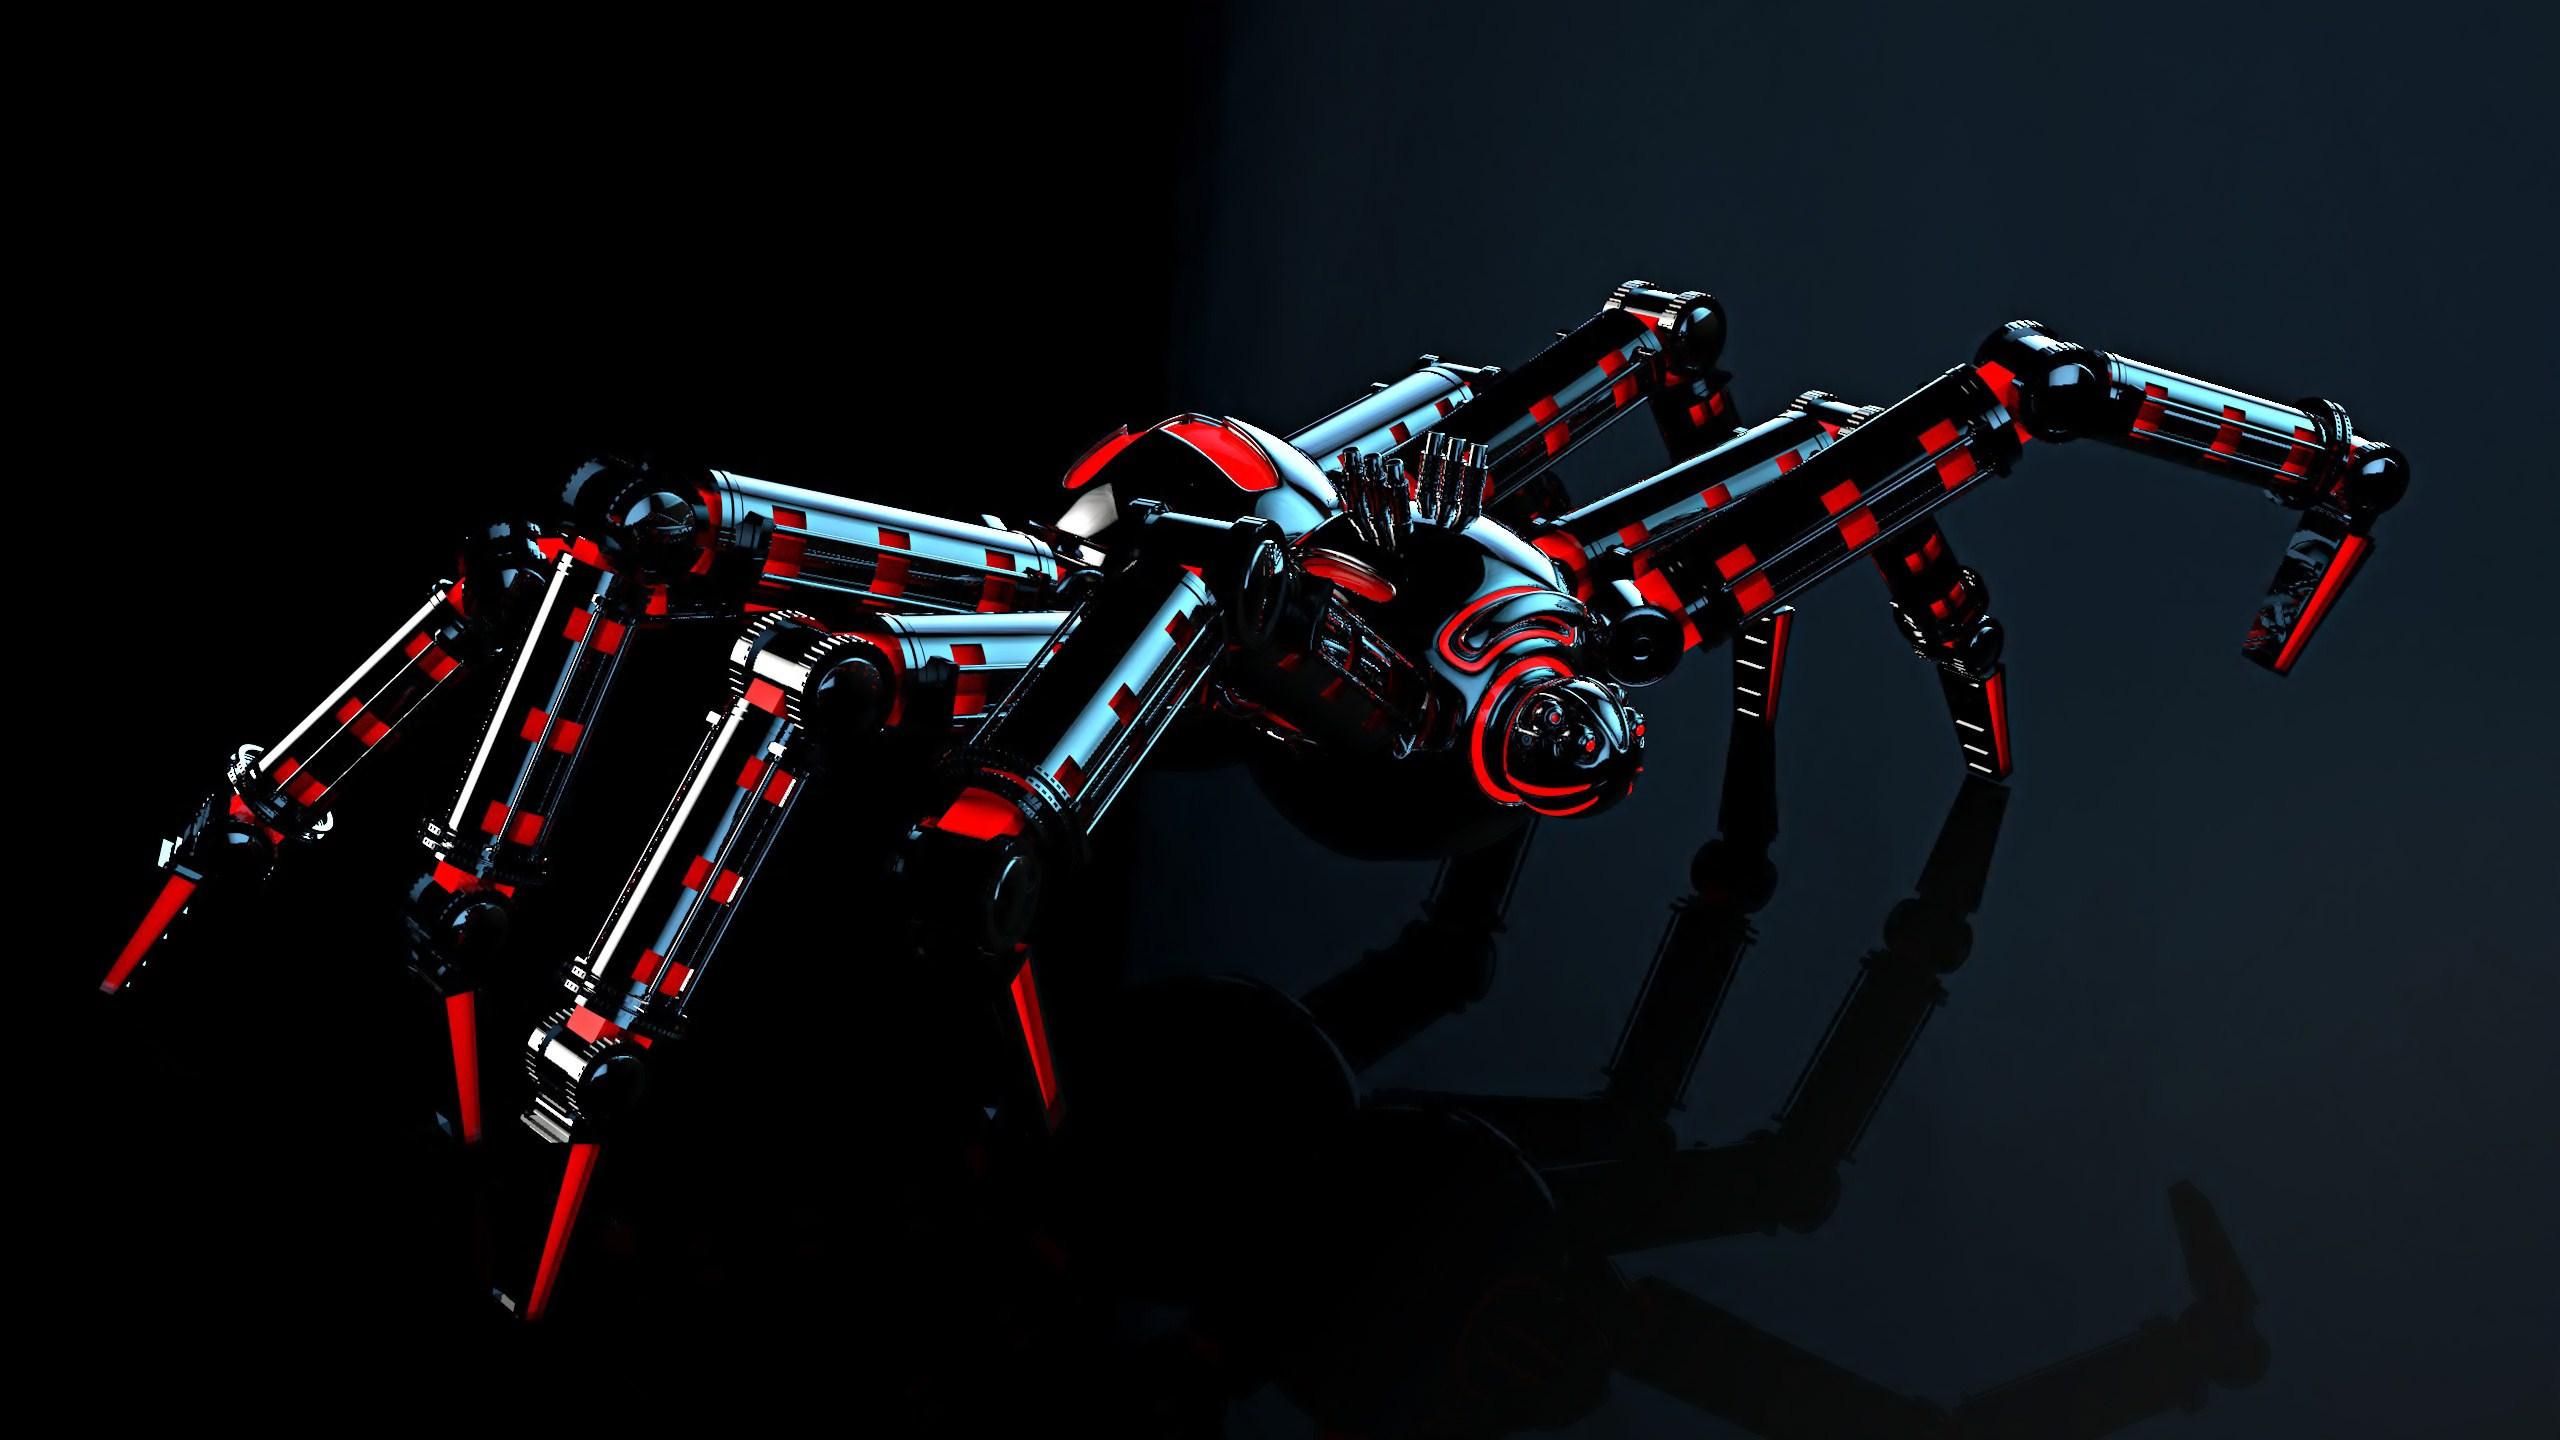 Black Widow Spider Wallpaper Hd wallpaper   1053037 2560x1440